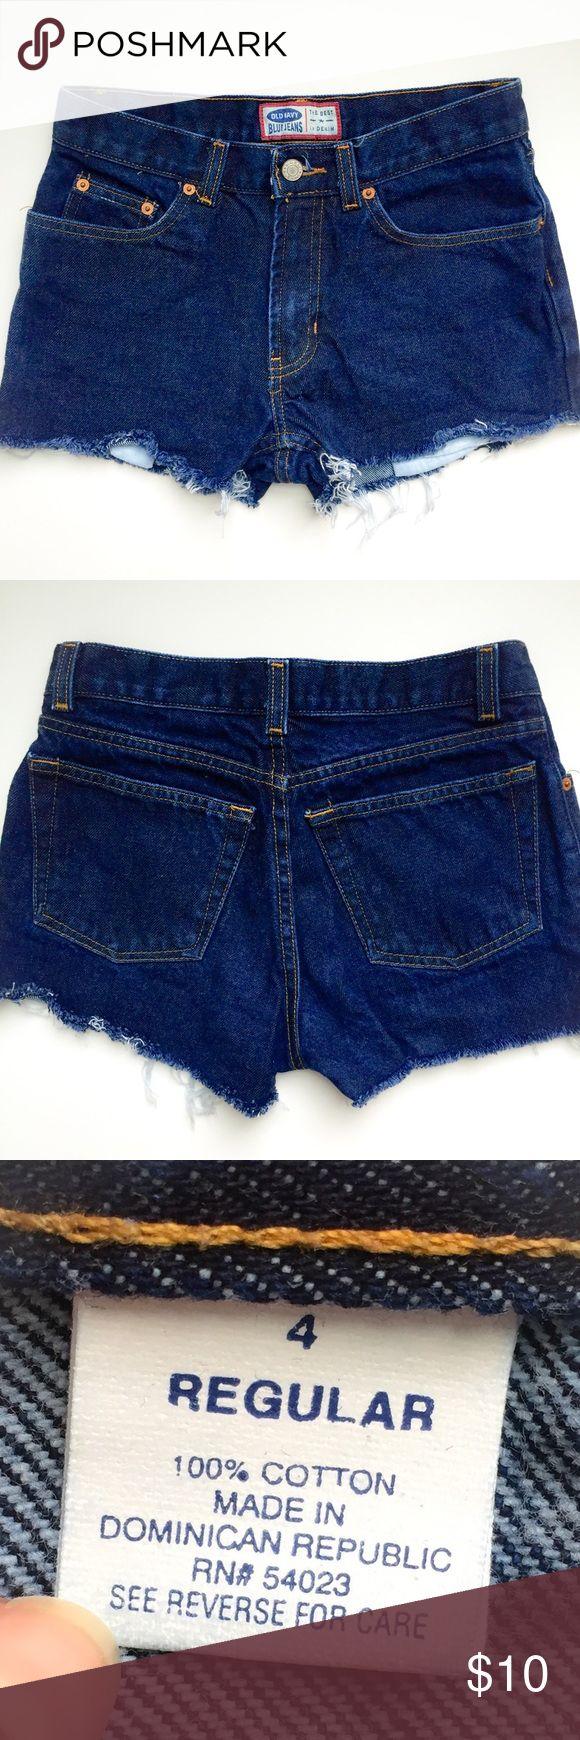 Cutoff Jean Shorts Old Navy cutoff Jean shorts. Size 4 regular. Old Navy Shorts Jean Shorts